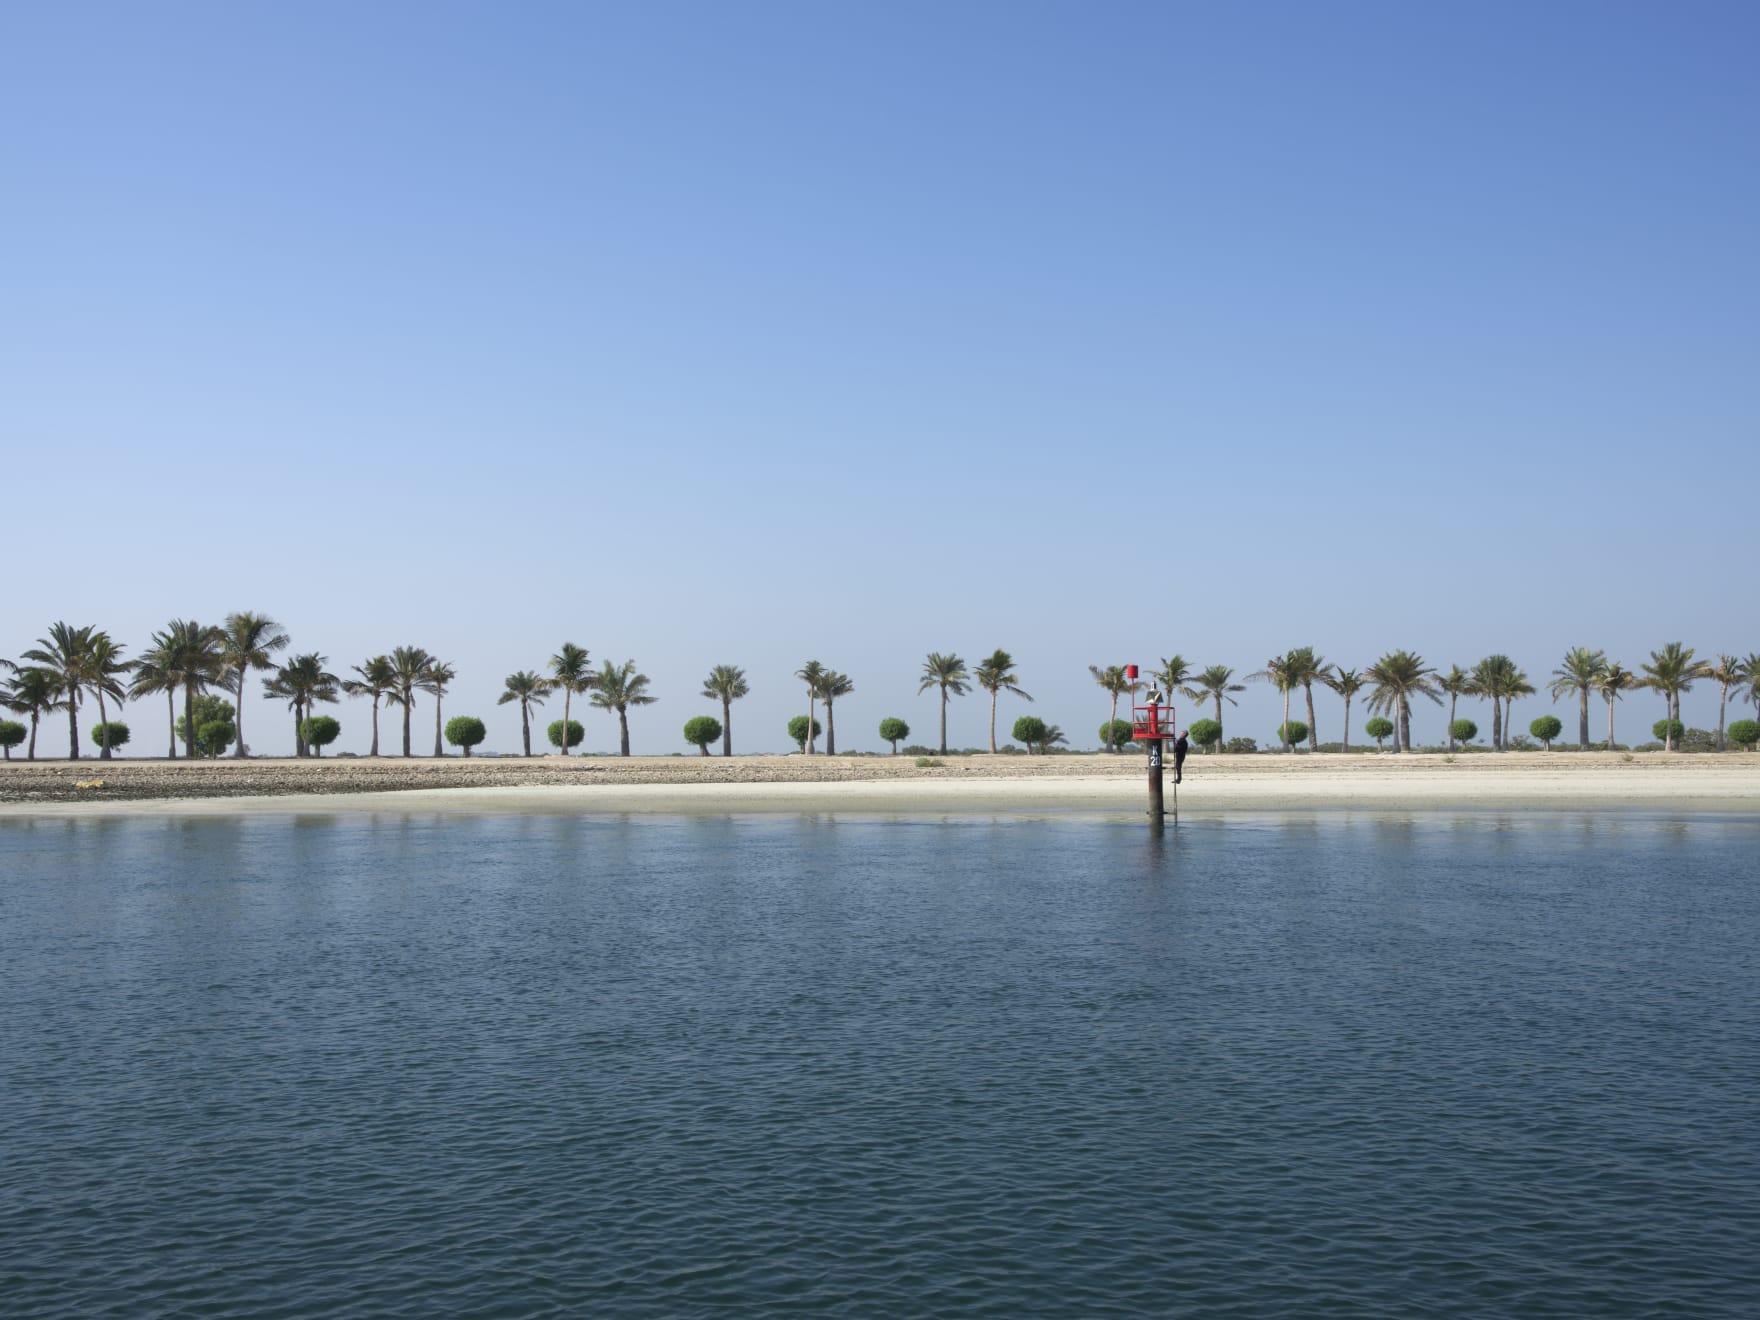 Tarek Al-Ghoussein, Abu Dhabi Archipelago (Alsader), 2015-, Digital Print, 60 x 80cm, Edition of 6 + 1 AP USD 8,000 (Excluding VAT)